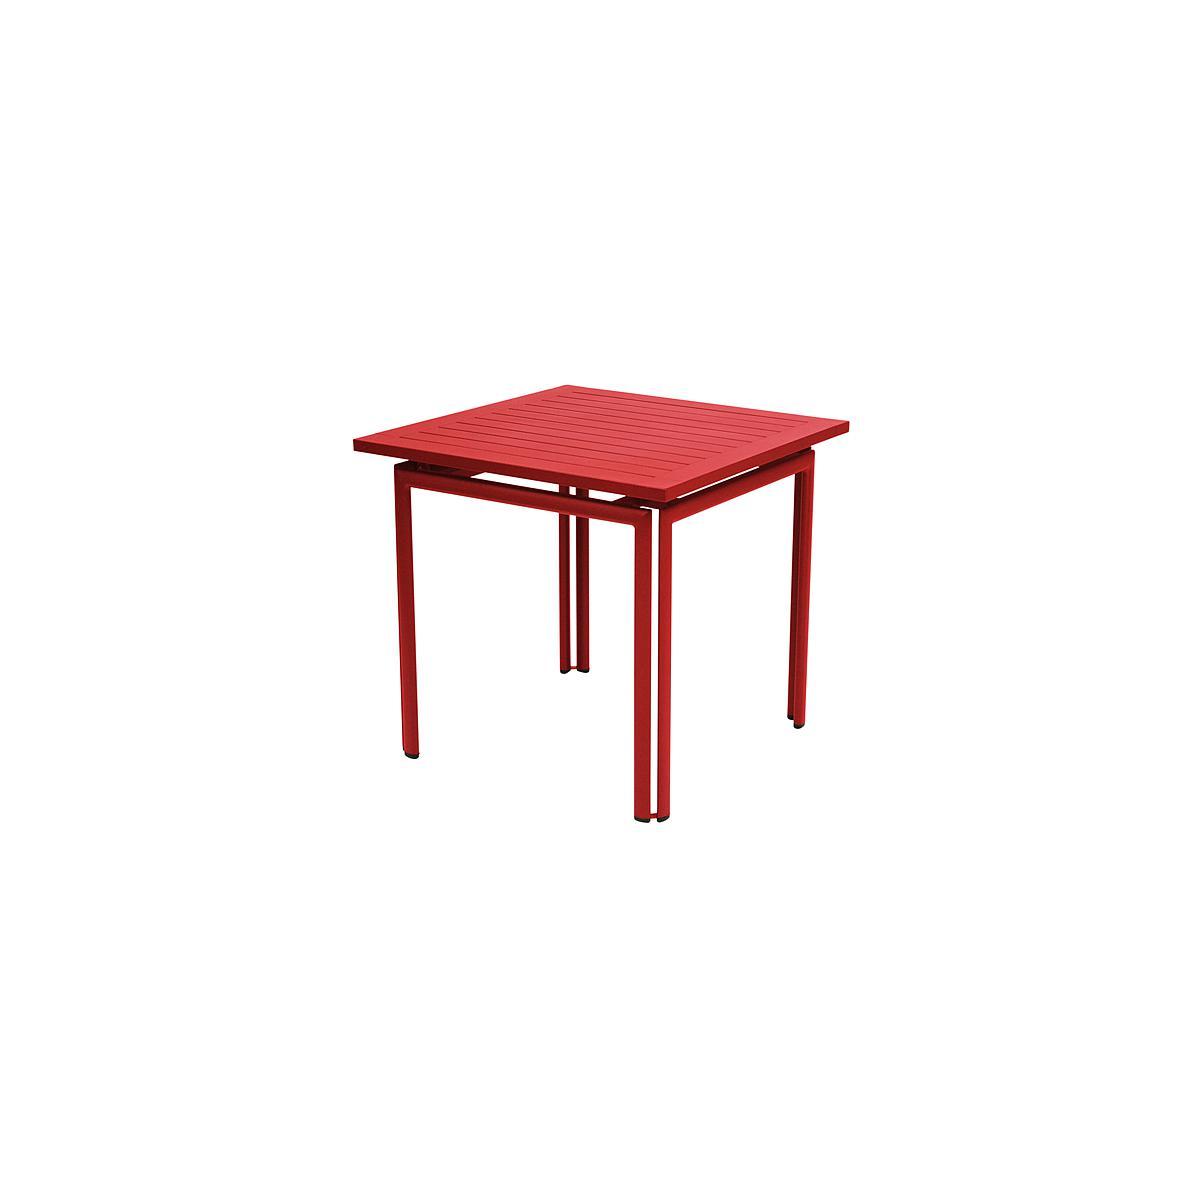 COSTA by Fermob Table 80x80 cm coquelicot